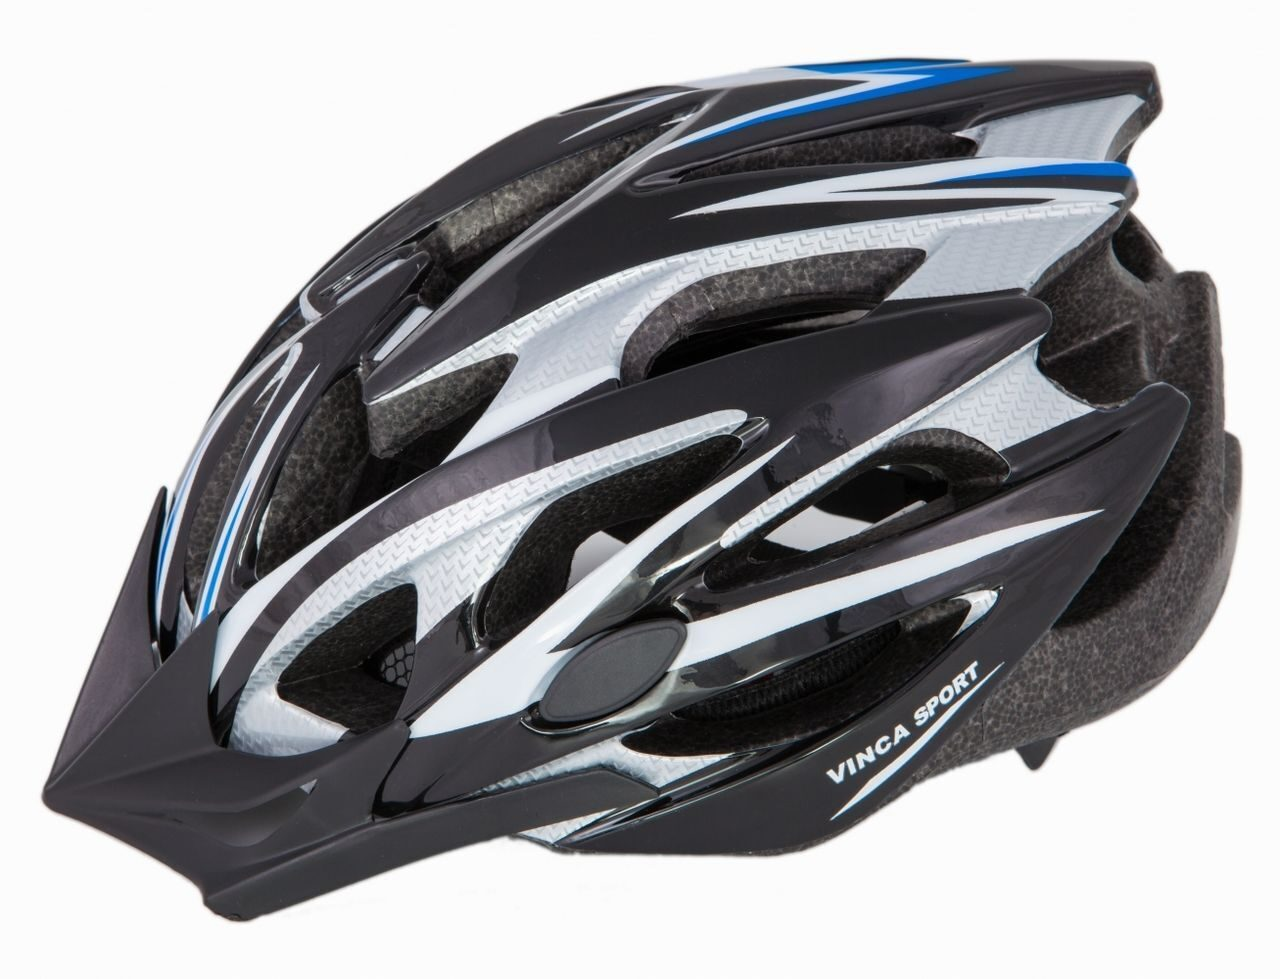 Шлем MTB Vinca sport VSH 29, серый/черный